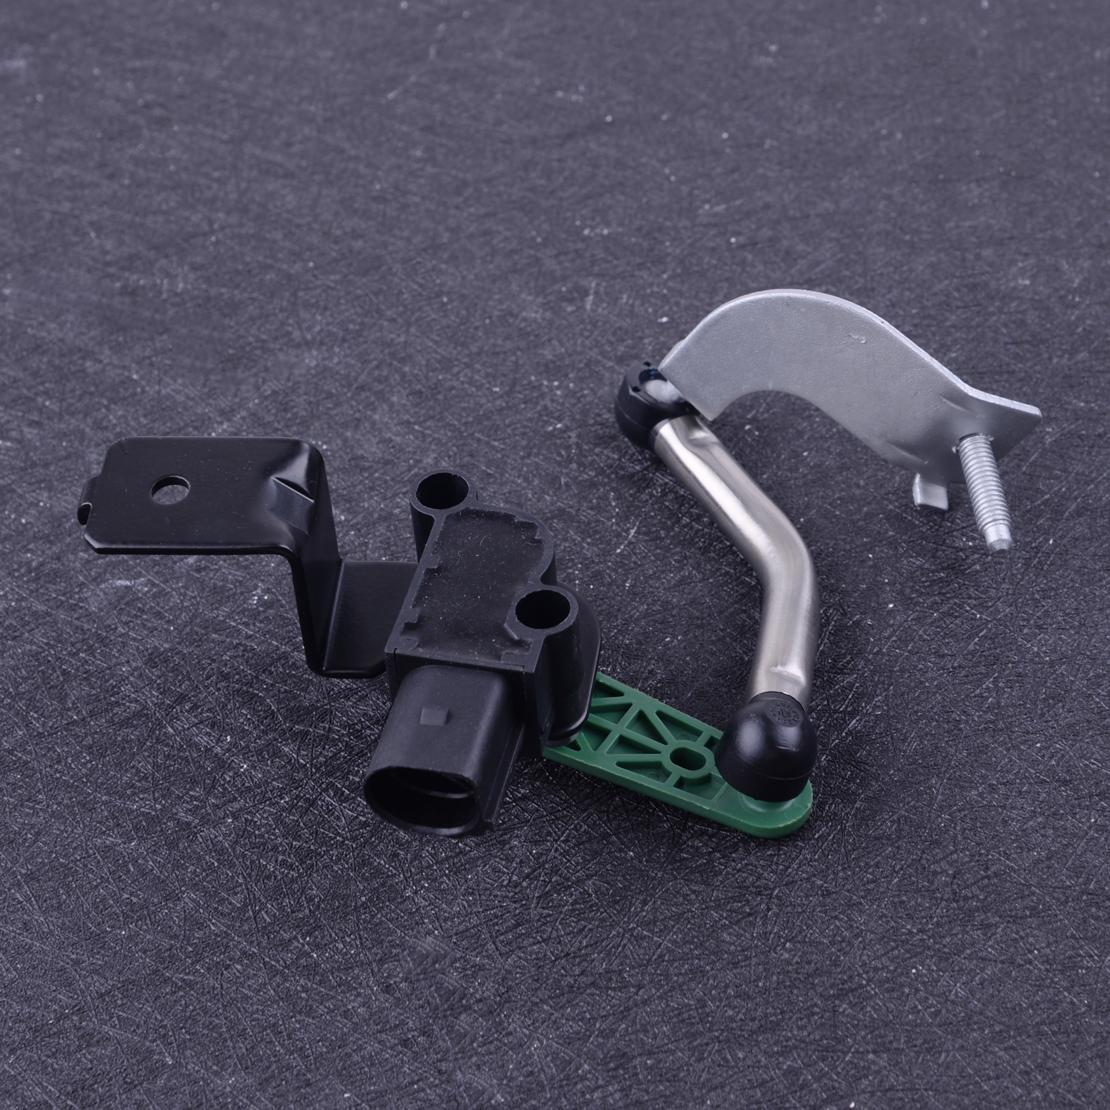 beler Front Right Headlamp Headlight Level Sensor Fit for AUDI Q3 VW Tiguan Passat CC Eos 3C0412522B